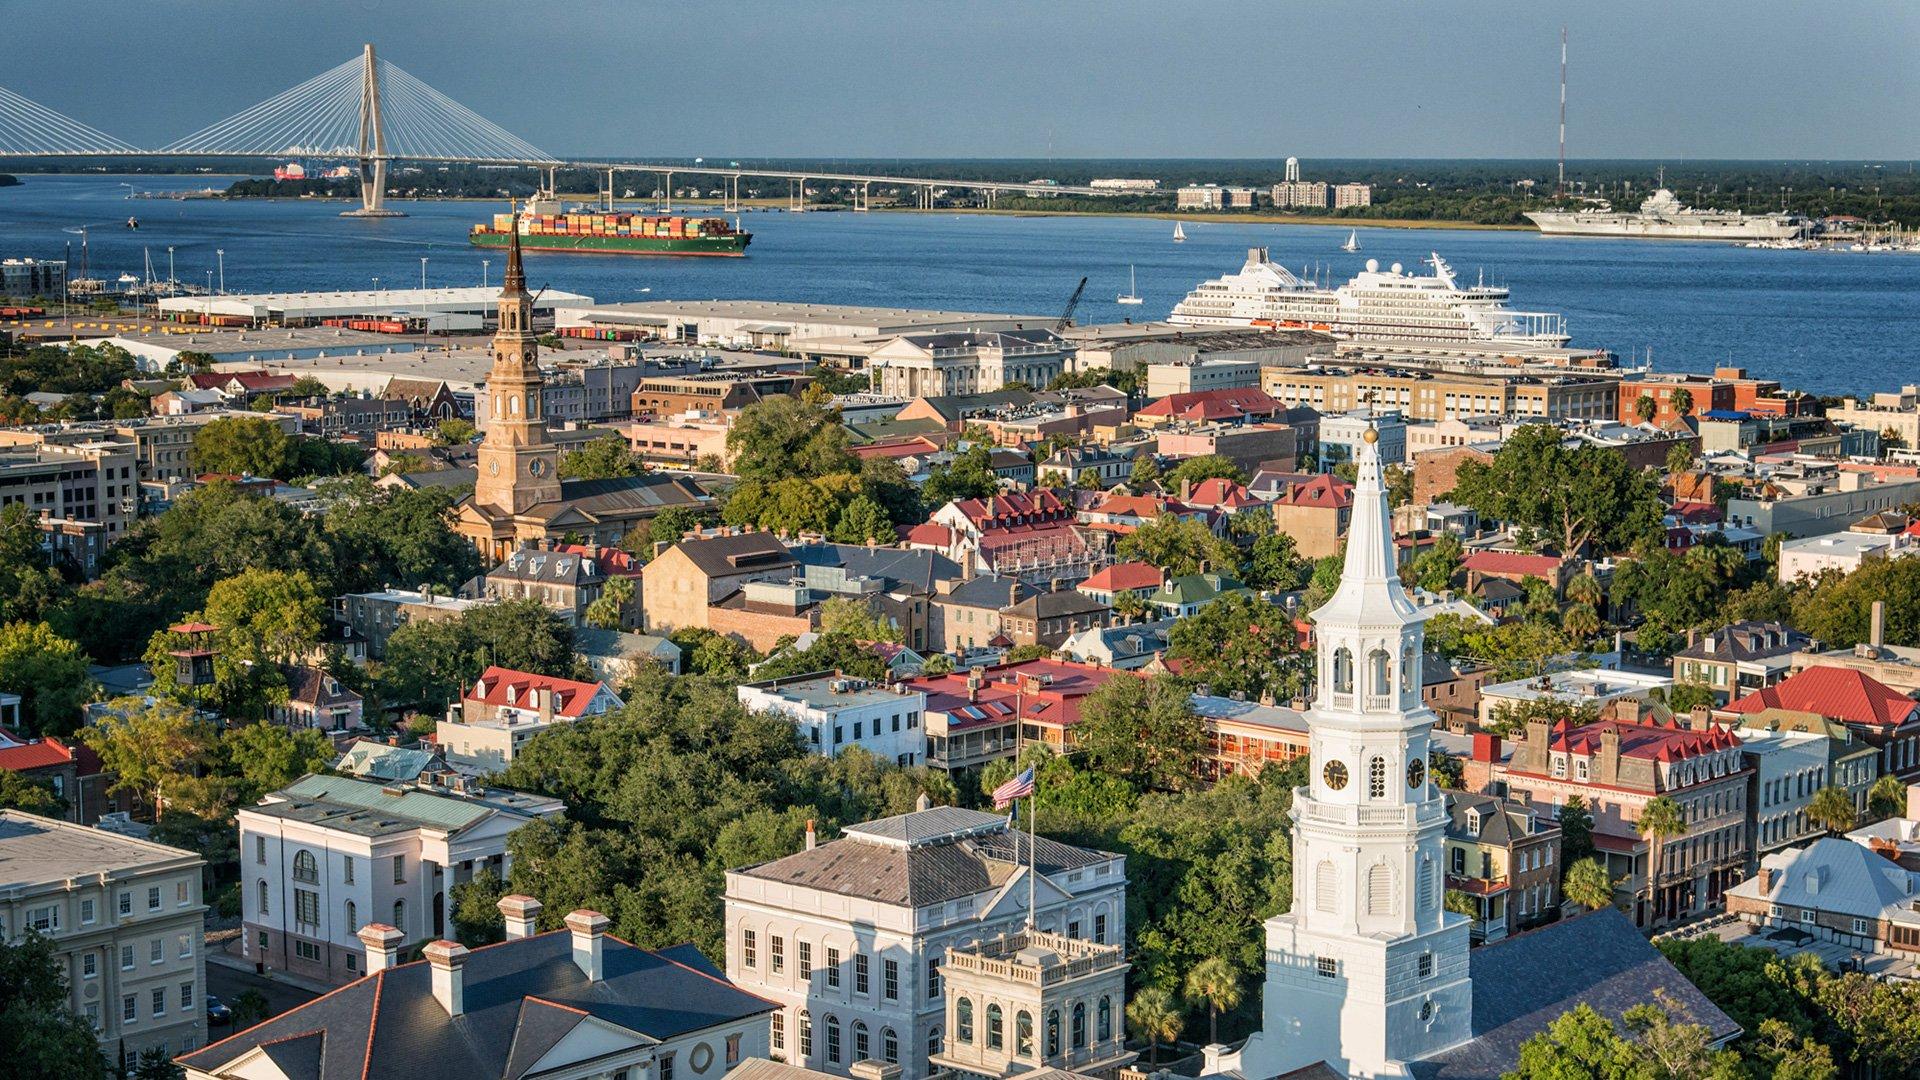 Pictured: Charleston skyline with bridge